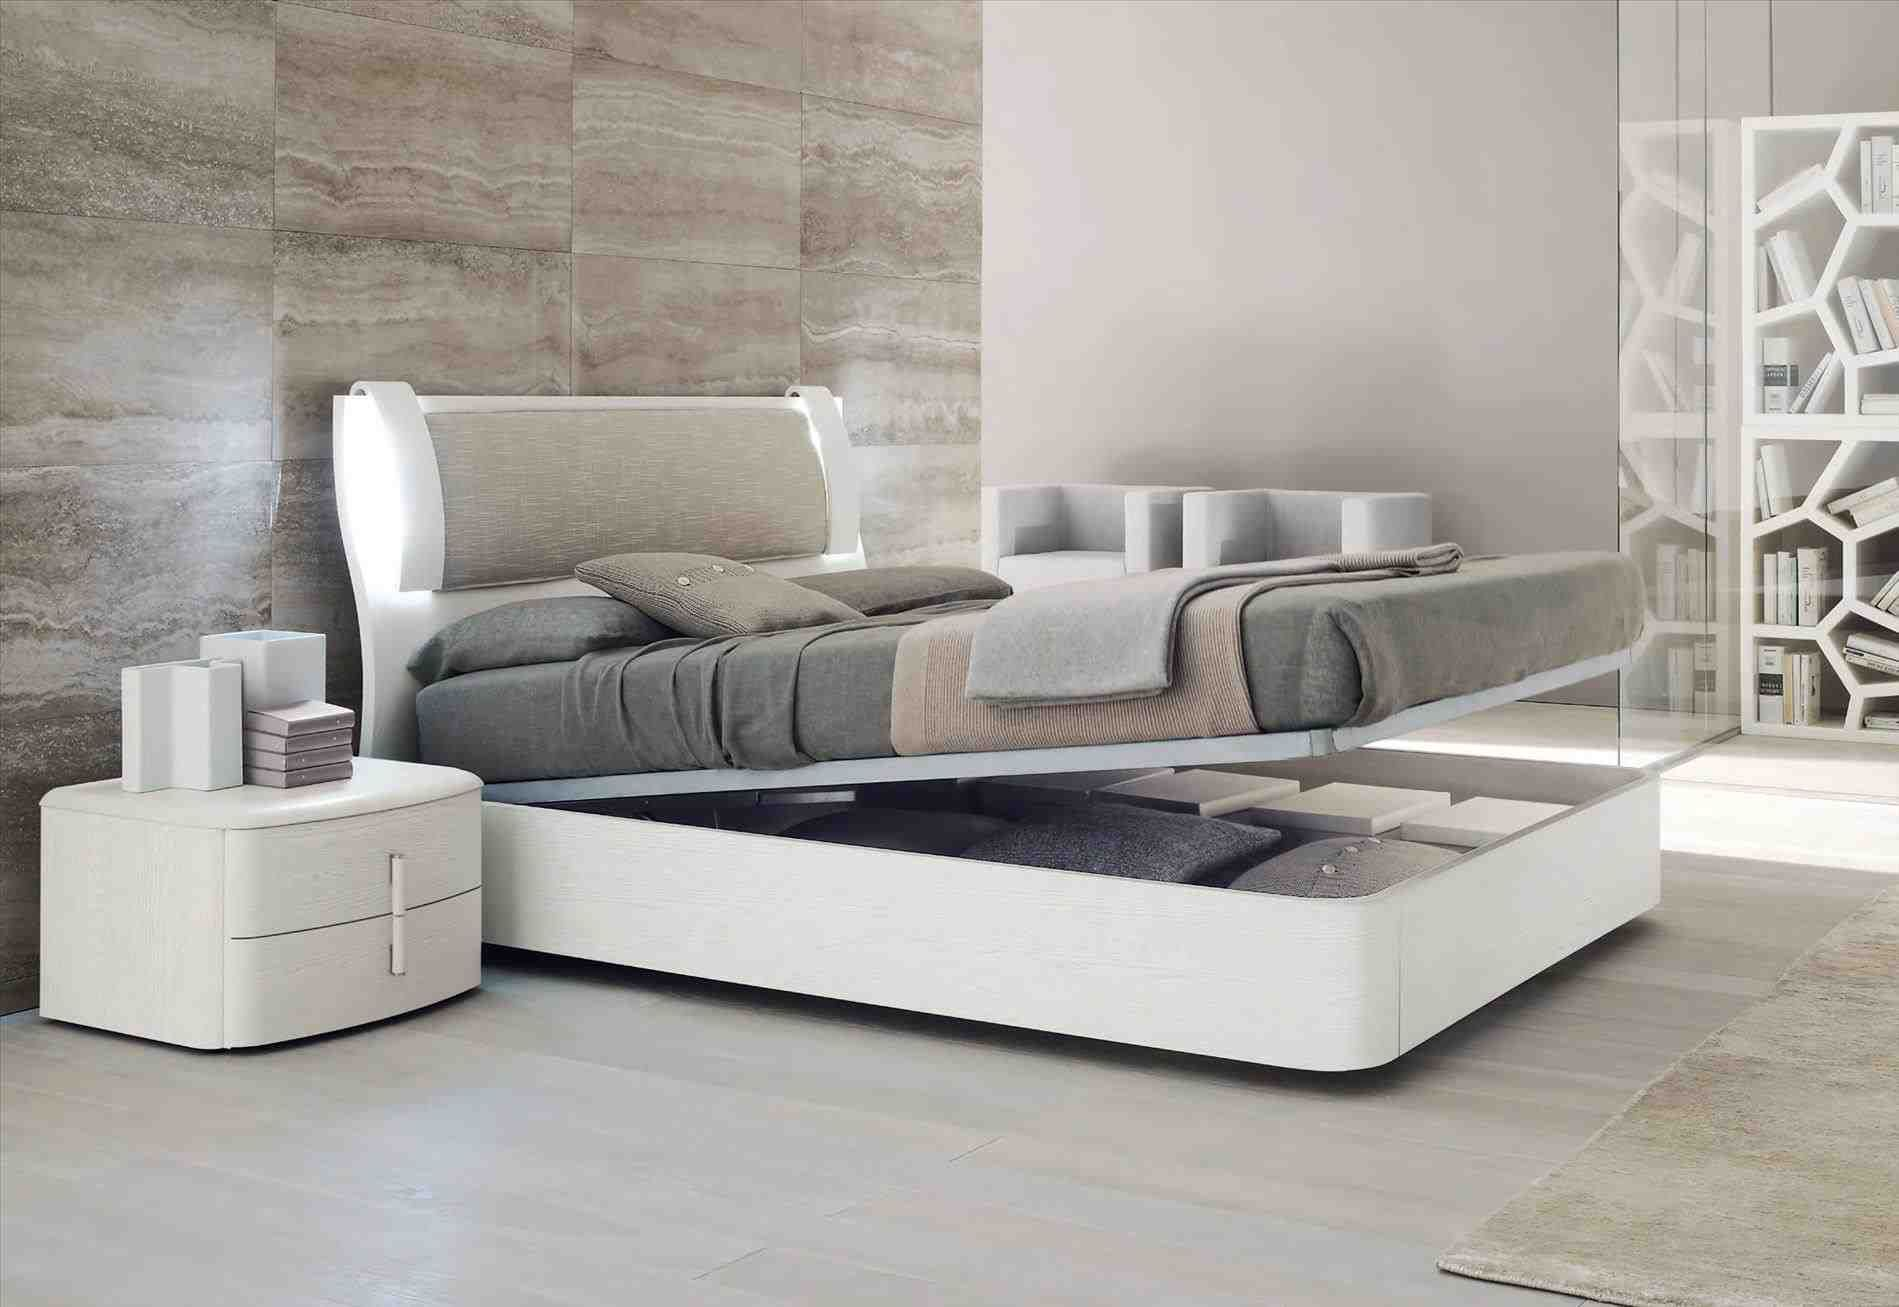 cheap sofa sets under 500 almayo barreiros modern furniture living room trendy image of fresh in design ideas wooden